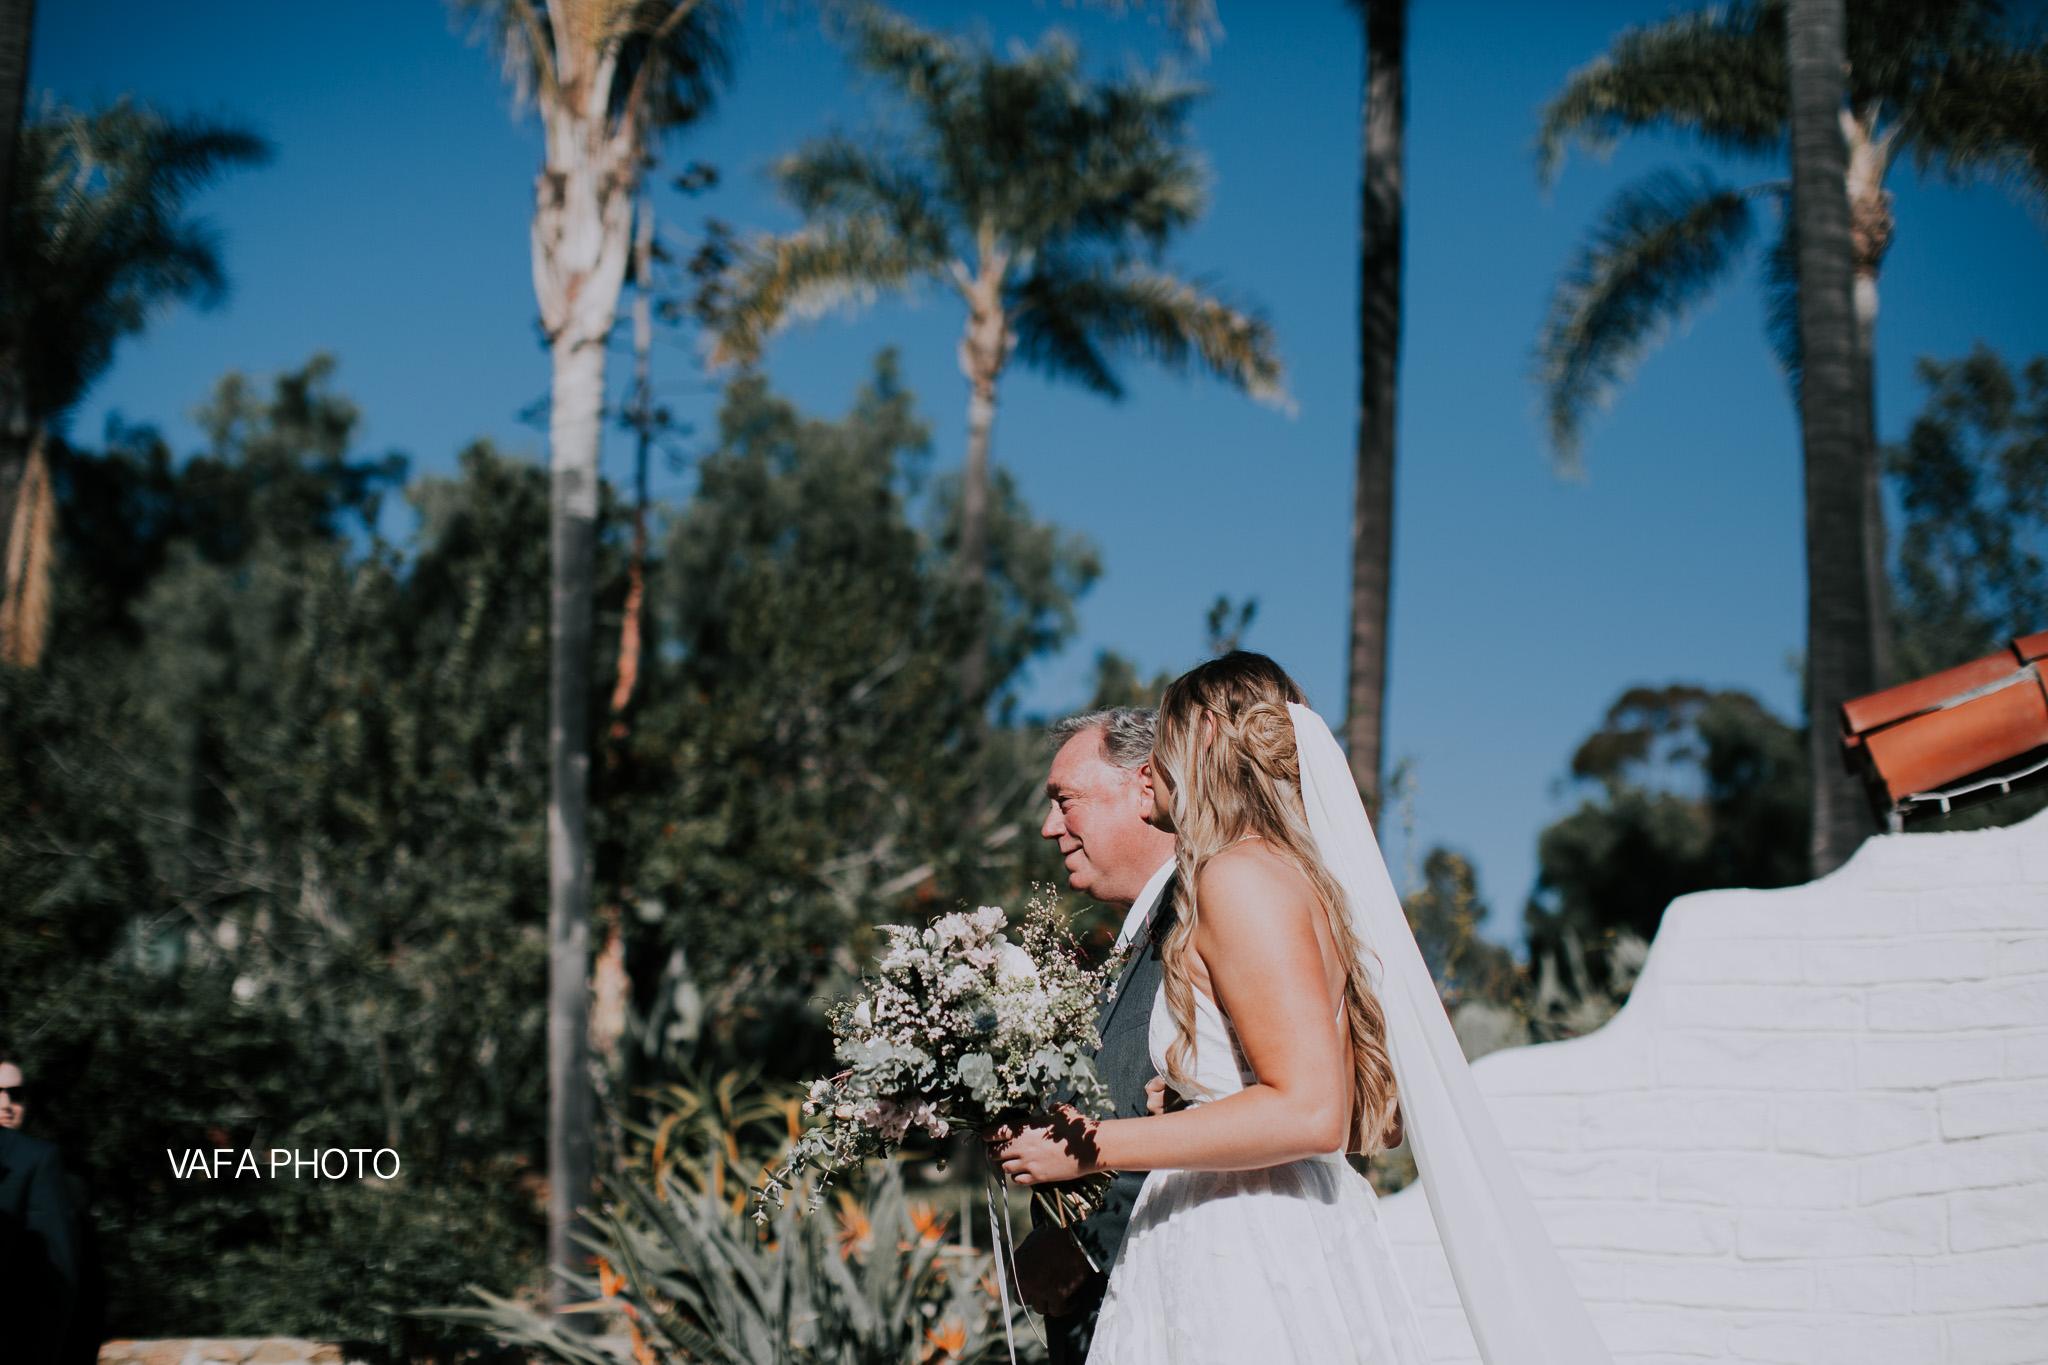 Leo-Carrillo-Ranch-Wedding-Lauren-Mike-Vafa-Photo-548.jpg